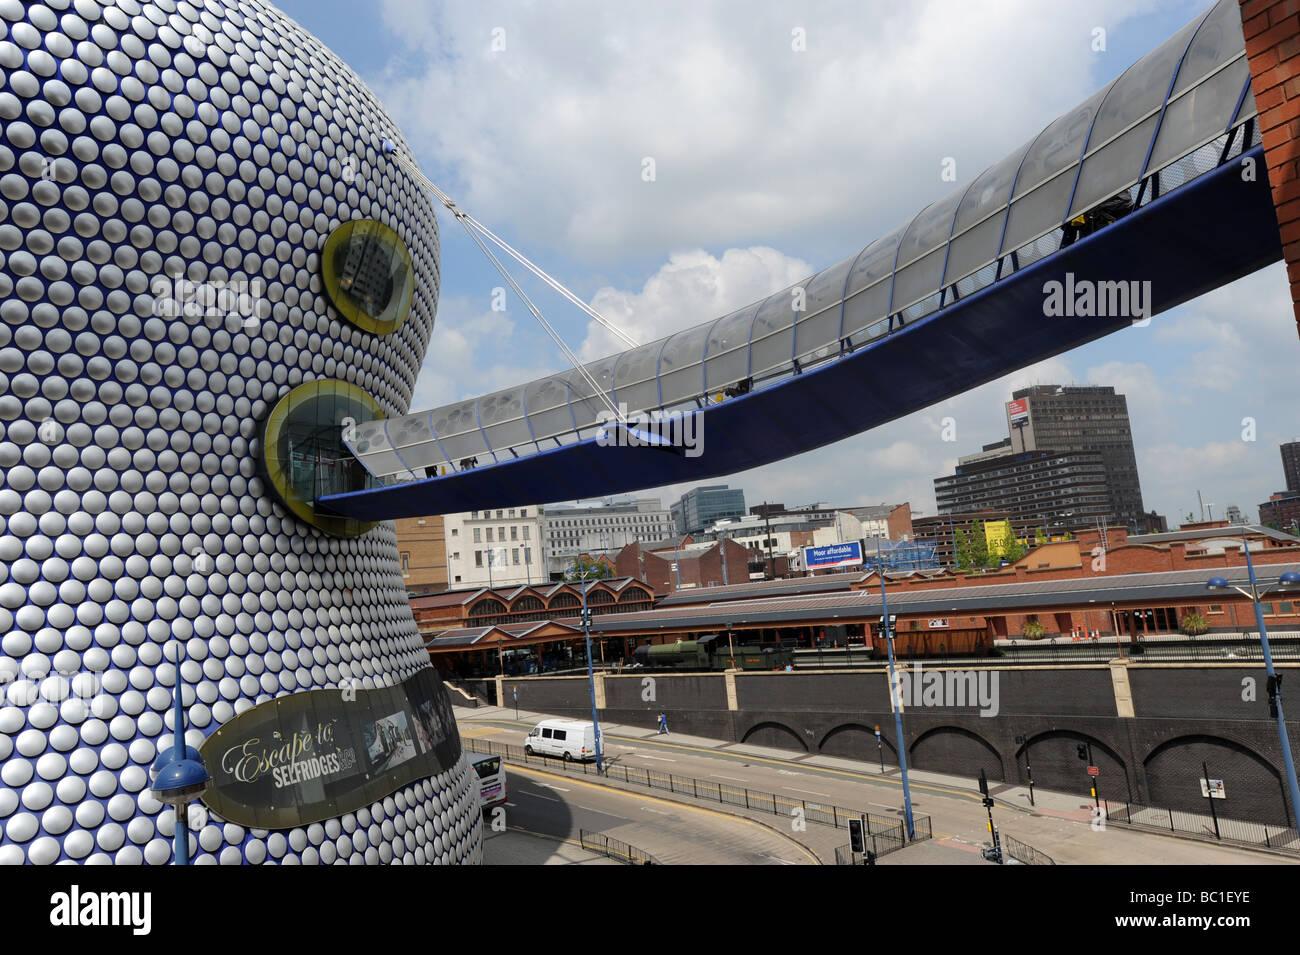 The skywalk entrance to Selfridges in the Bullring Birmingham England Uk - Stock Image